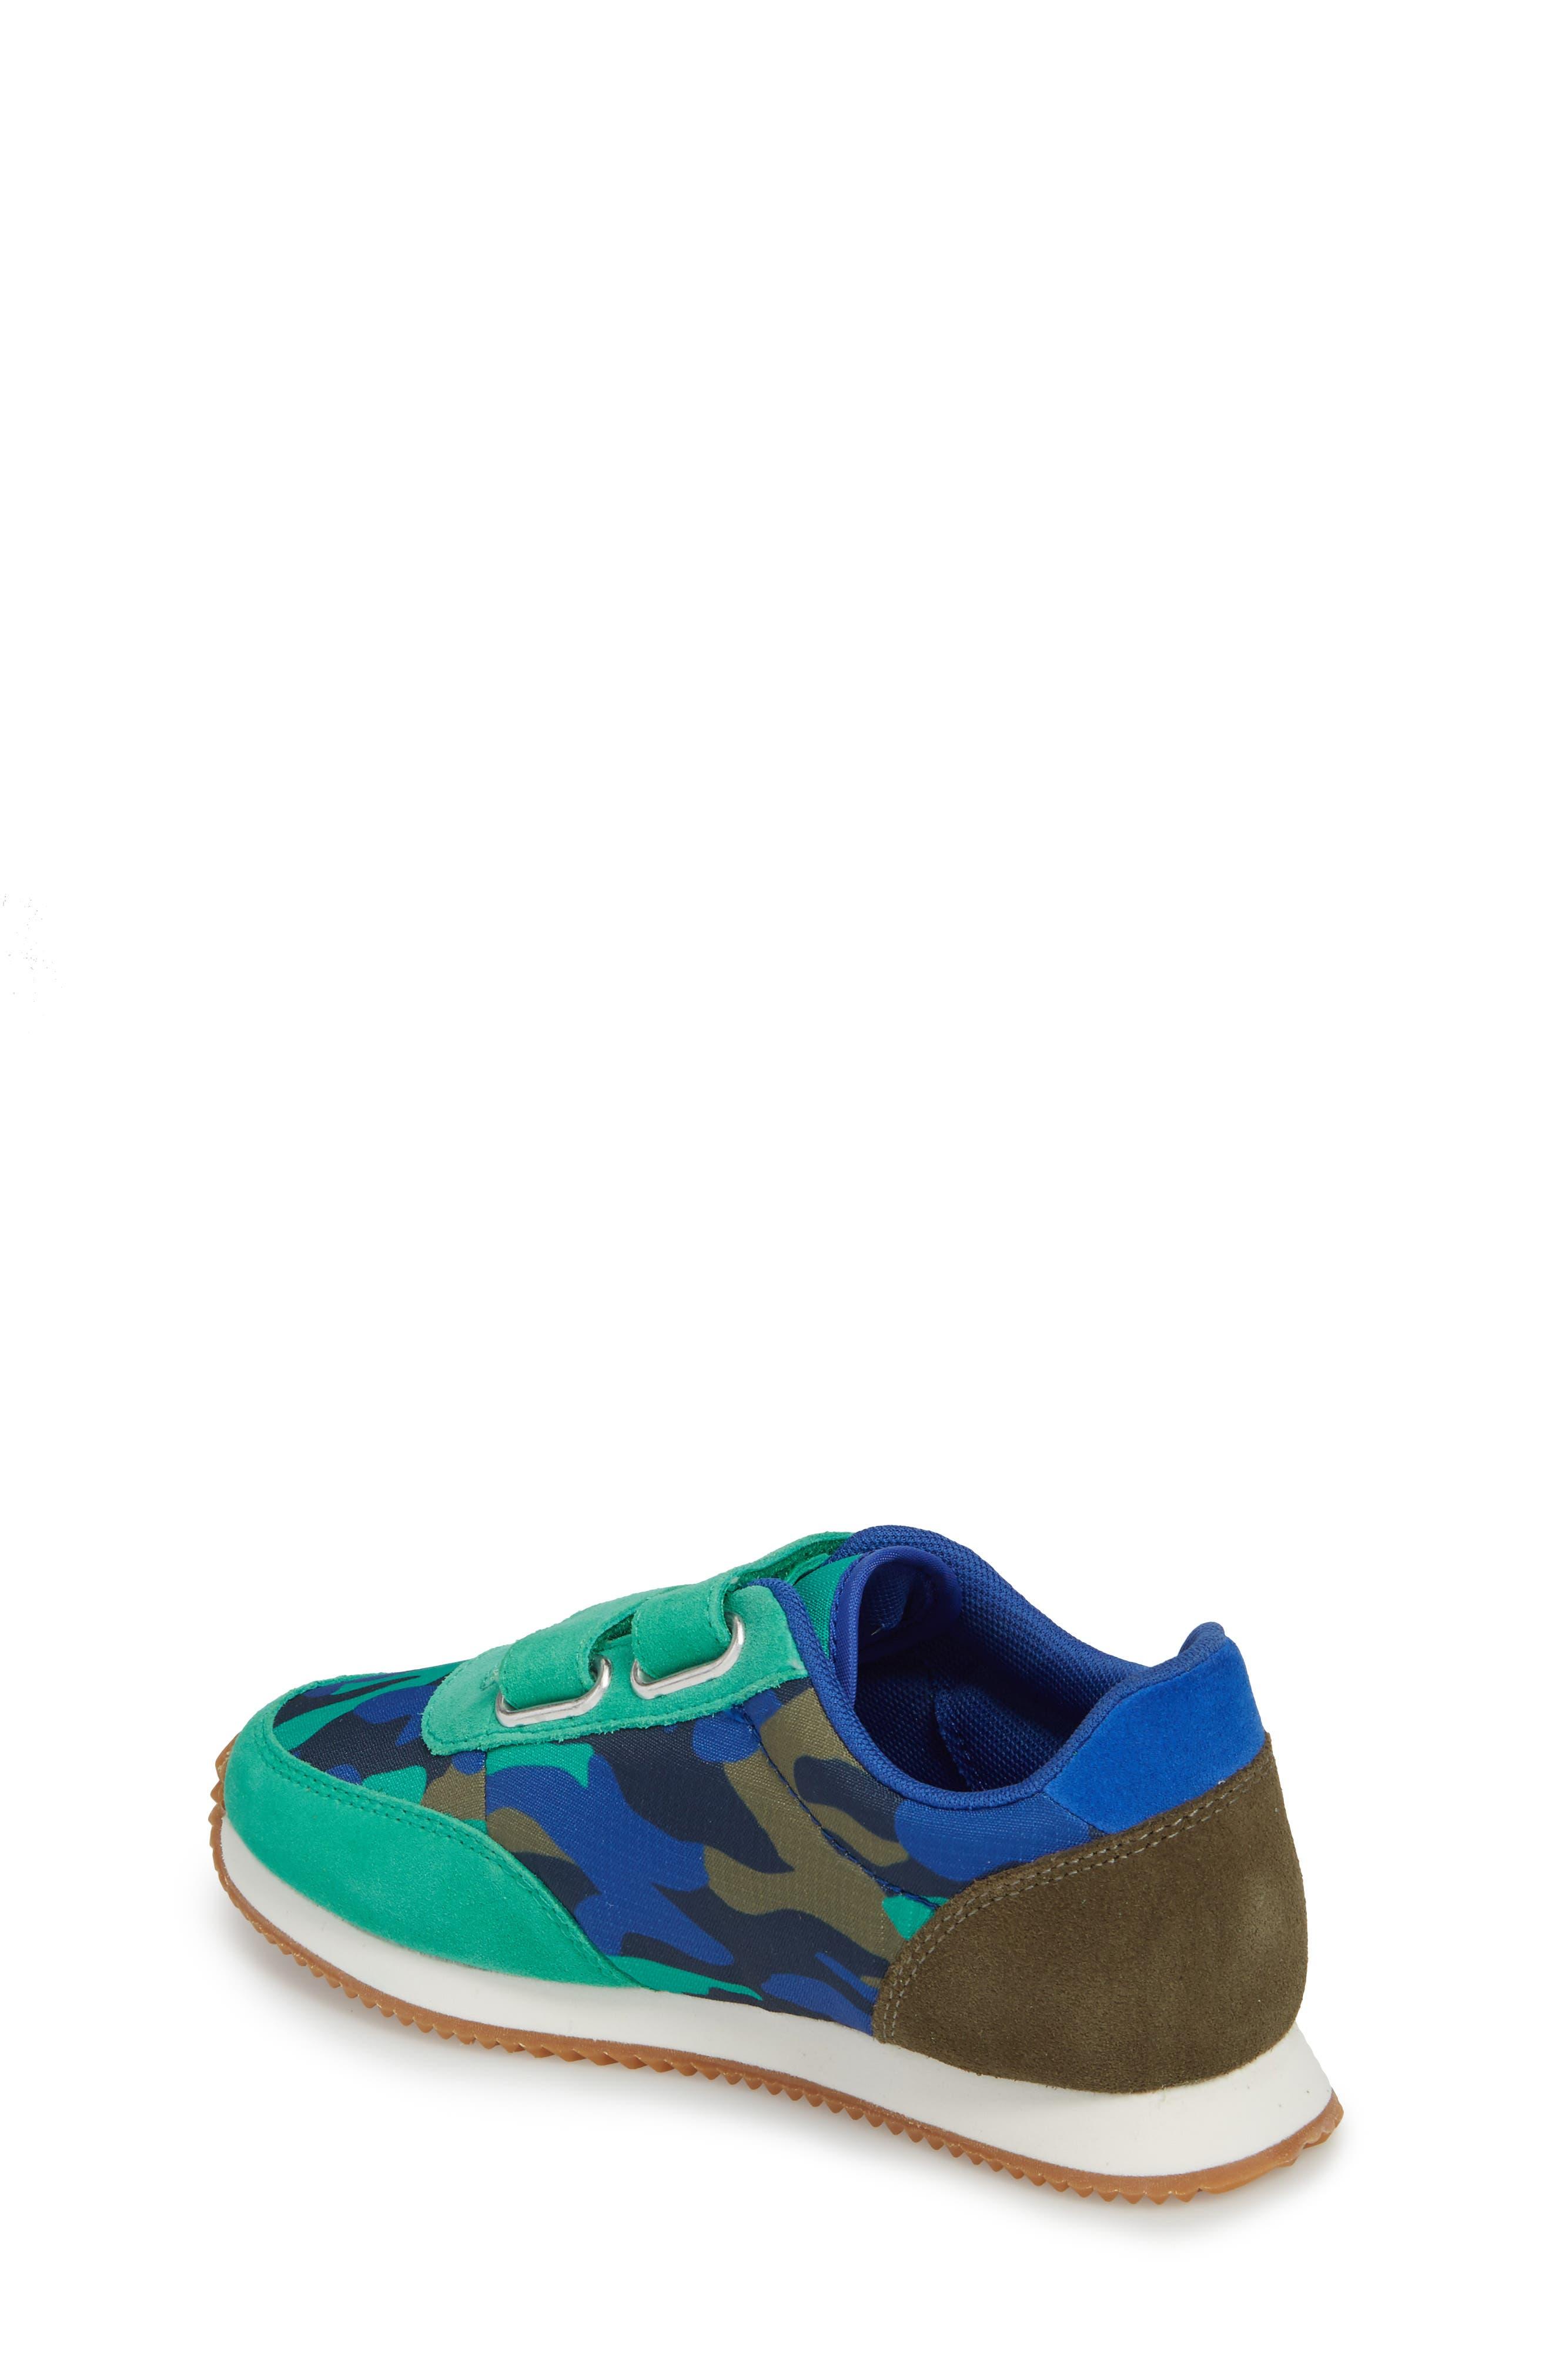 Print Sneakers,                             Alternate thumbnail 2, color,                             Astro Green